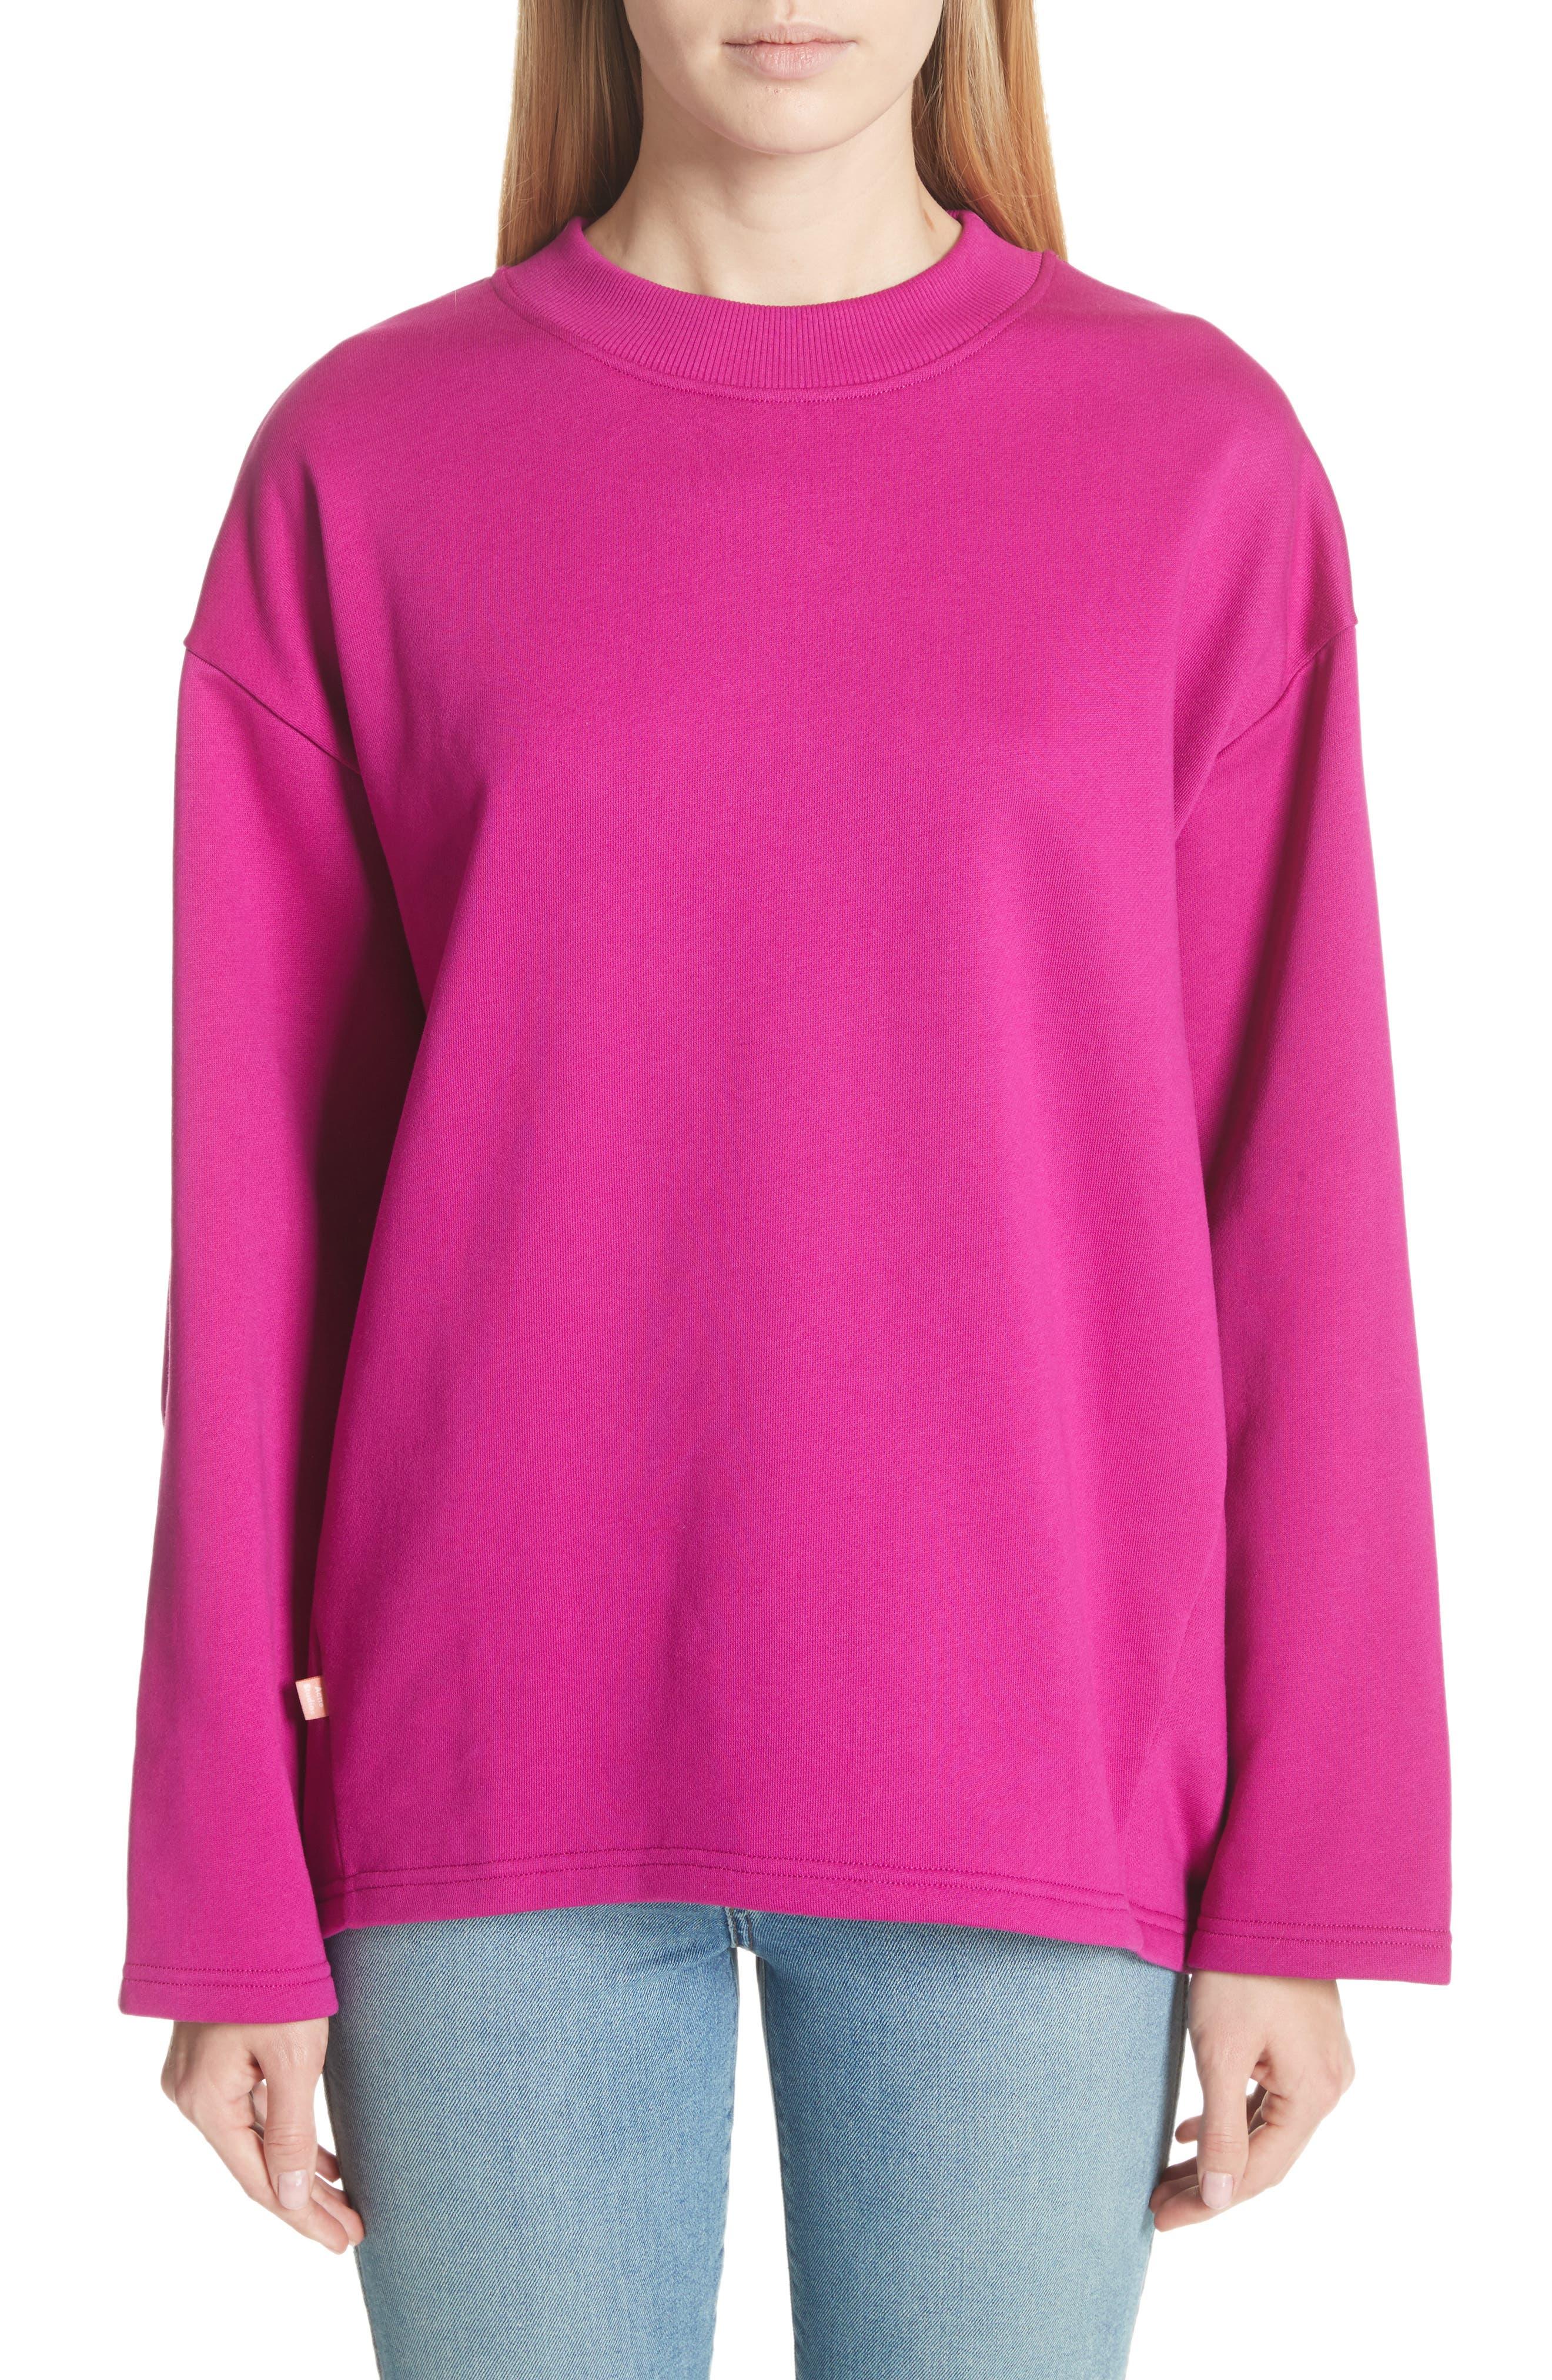 Karvell Sweatshirt,                             Main thumbnail 1, color,                             500